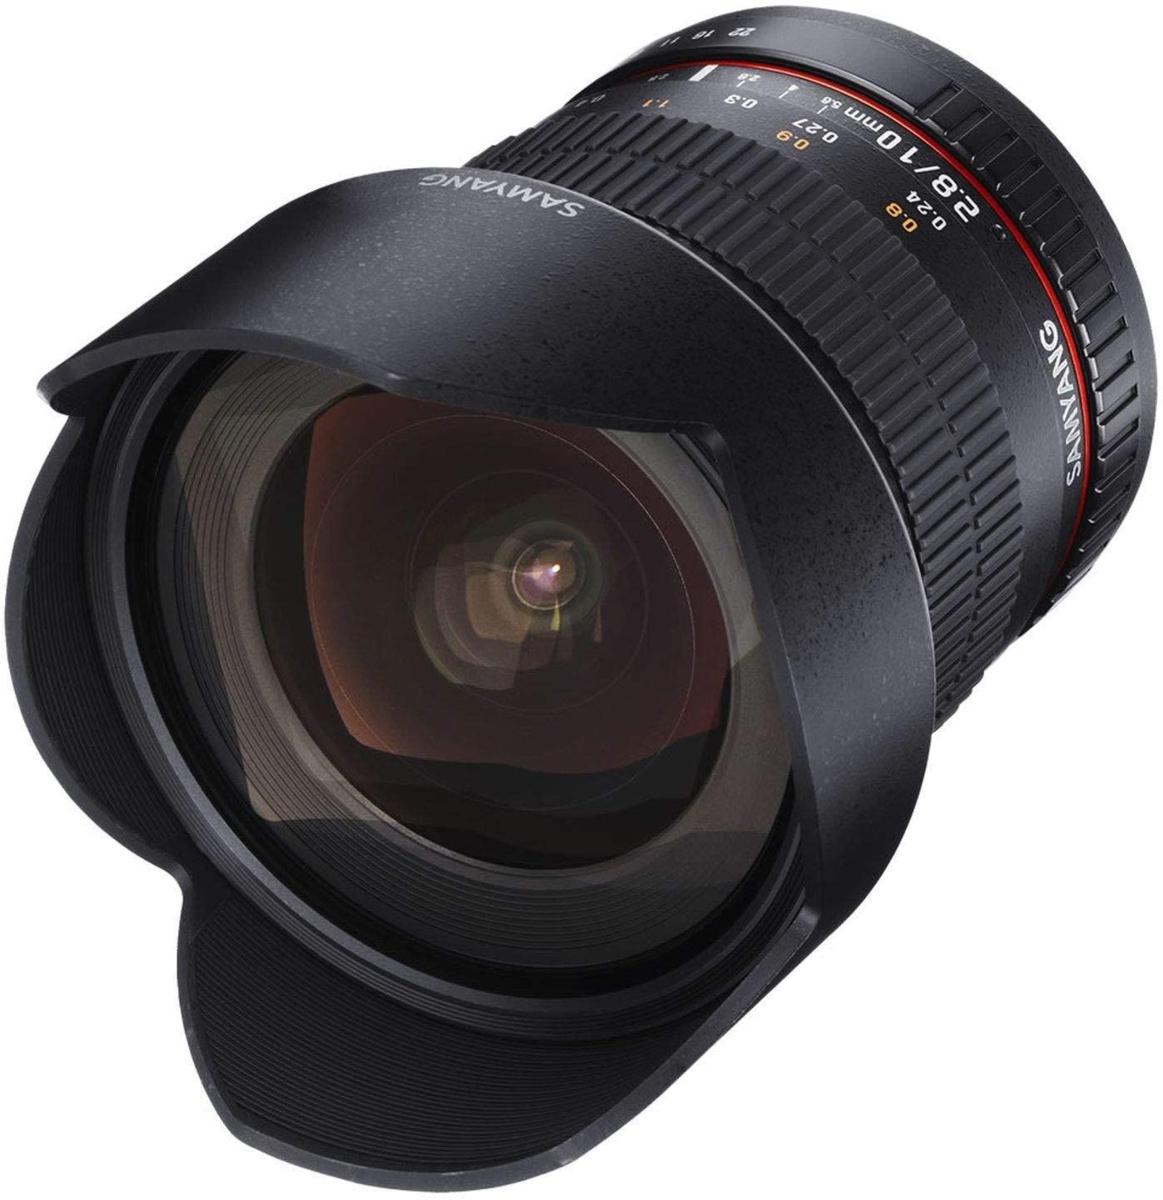 SAMYANG 単焦点広角レンズ 10mm F2.8 キヤノン EOS M用 APS-C用